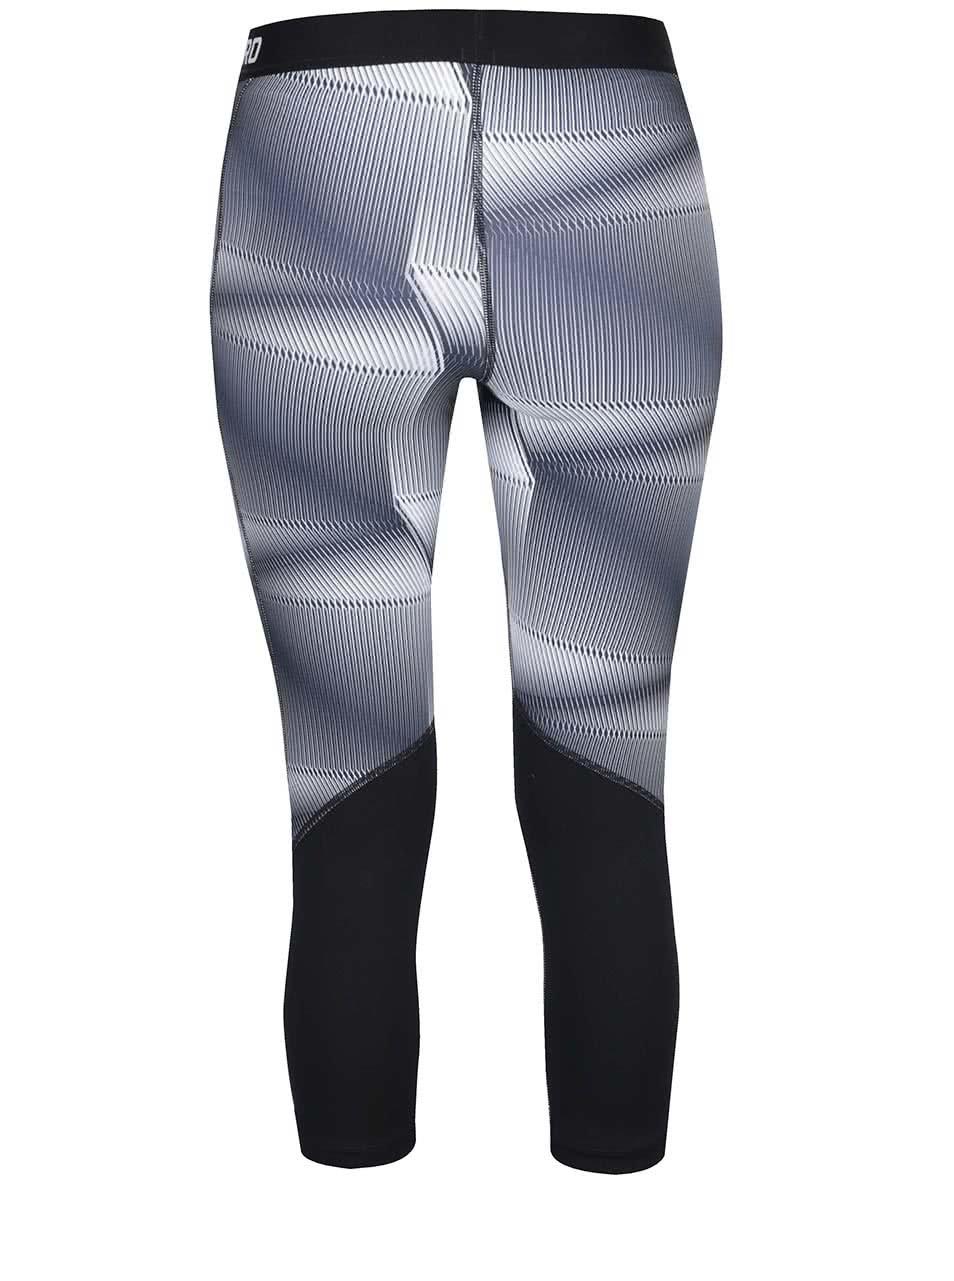 Modro-sivé dámske vzorované funkčné 3 4 legíny Nike Pro Cool ... ea84896ef4